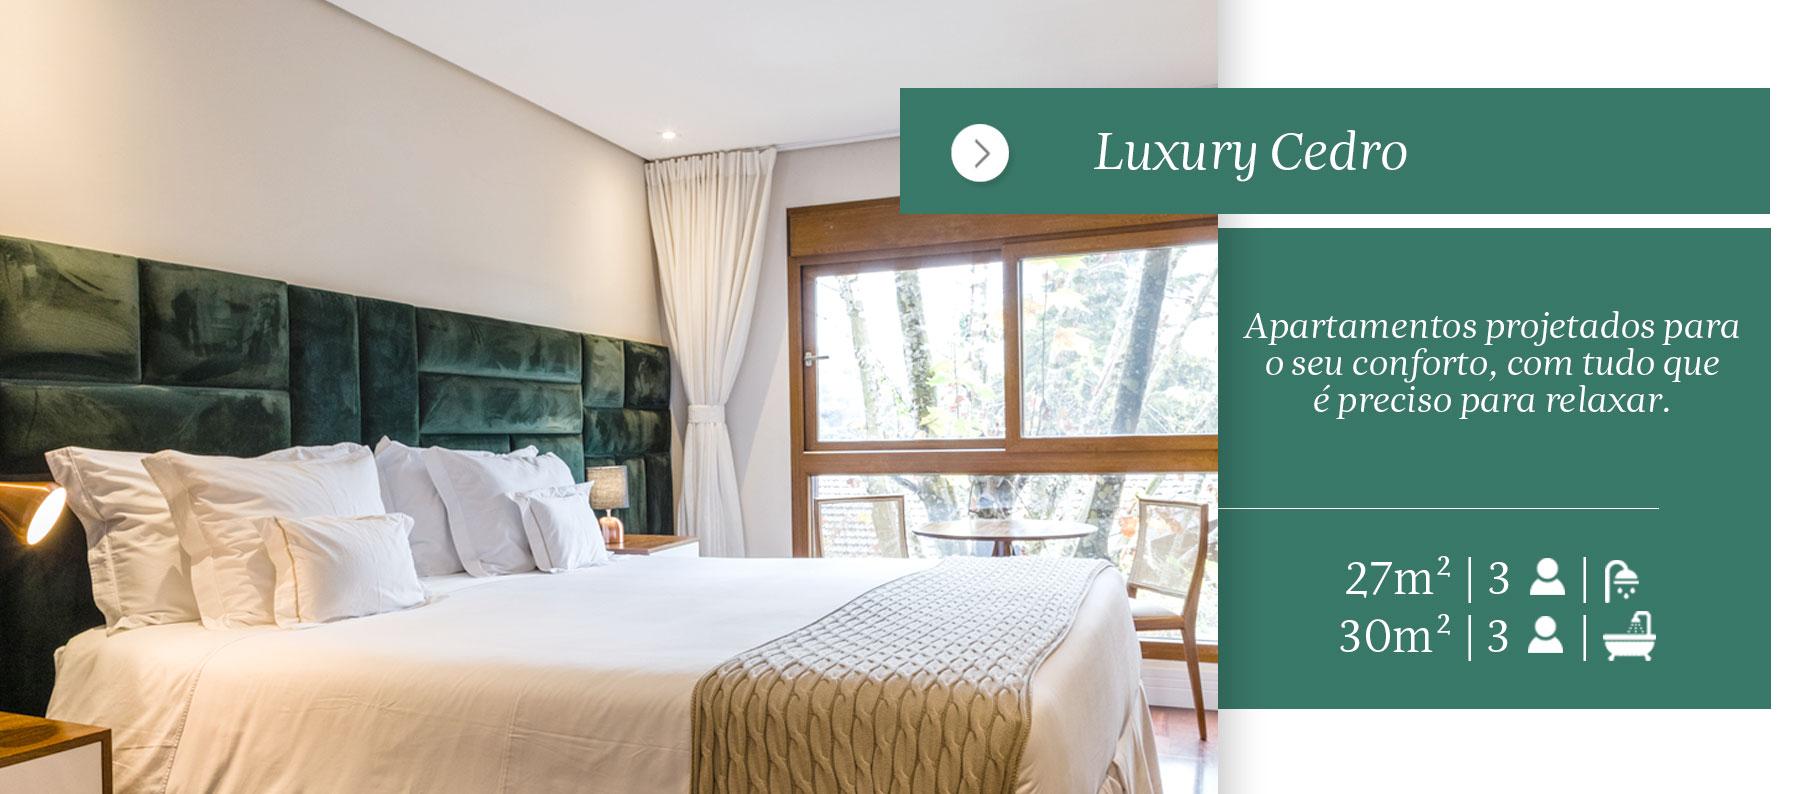 Cedro Hotel Quebra-Noz